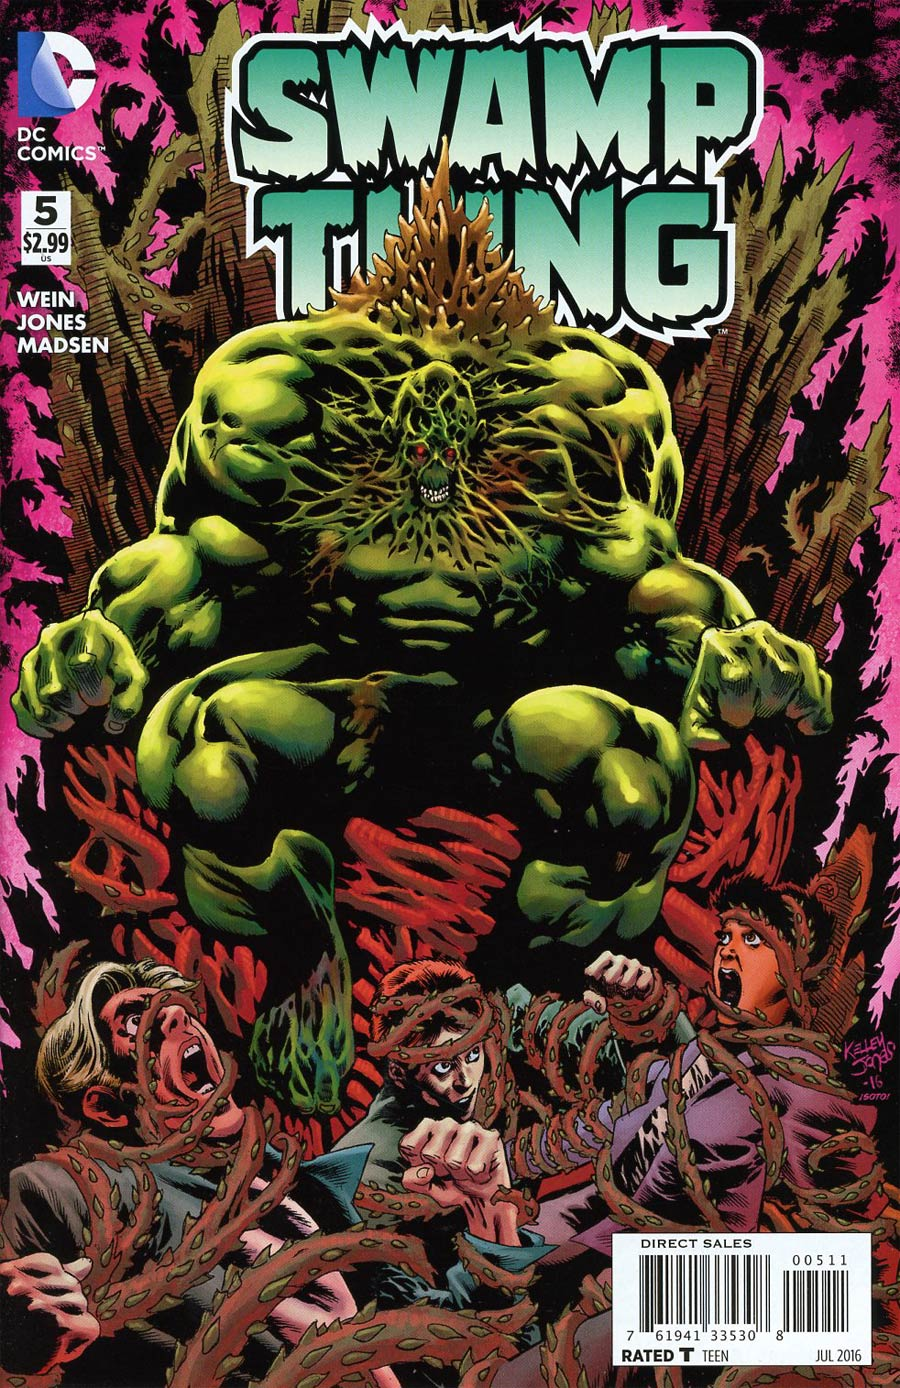 Swamp Thing Vol 6 #5